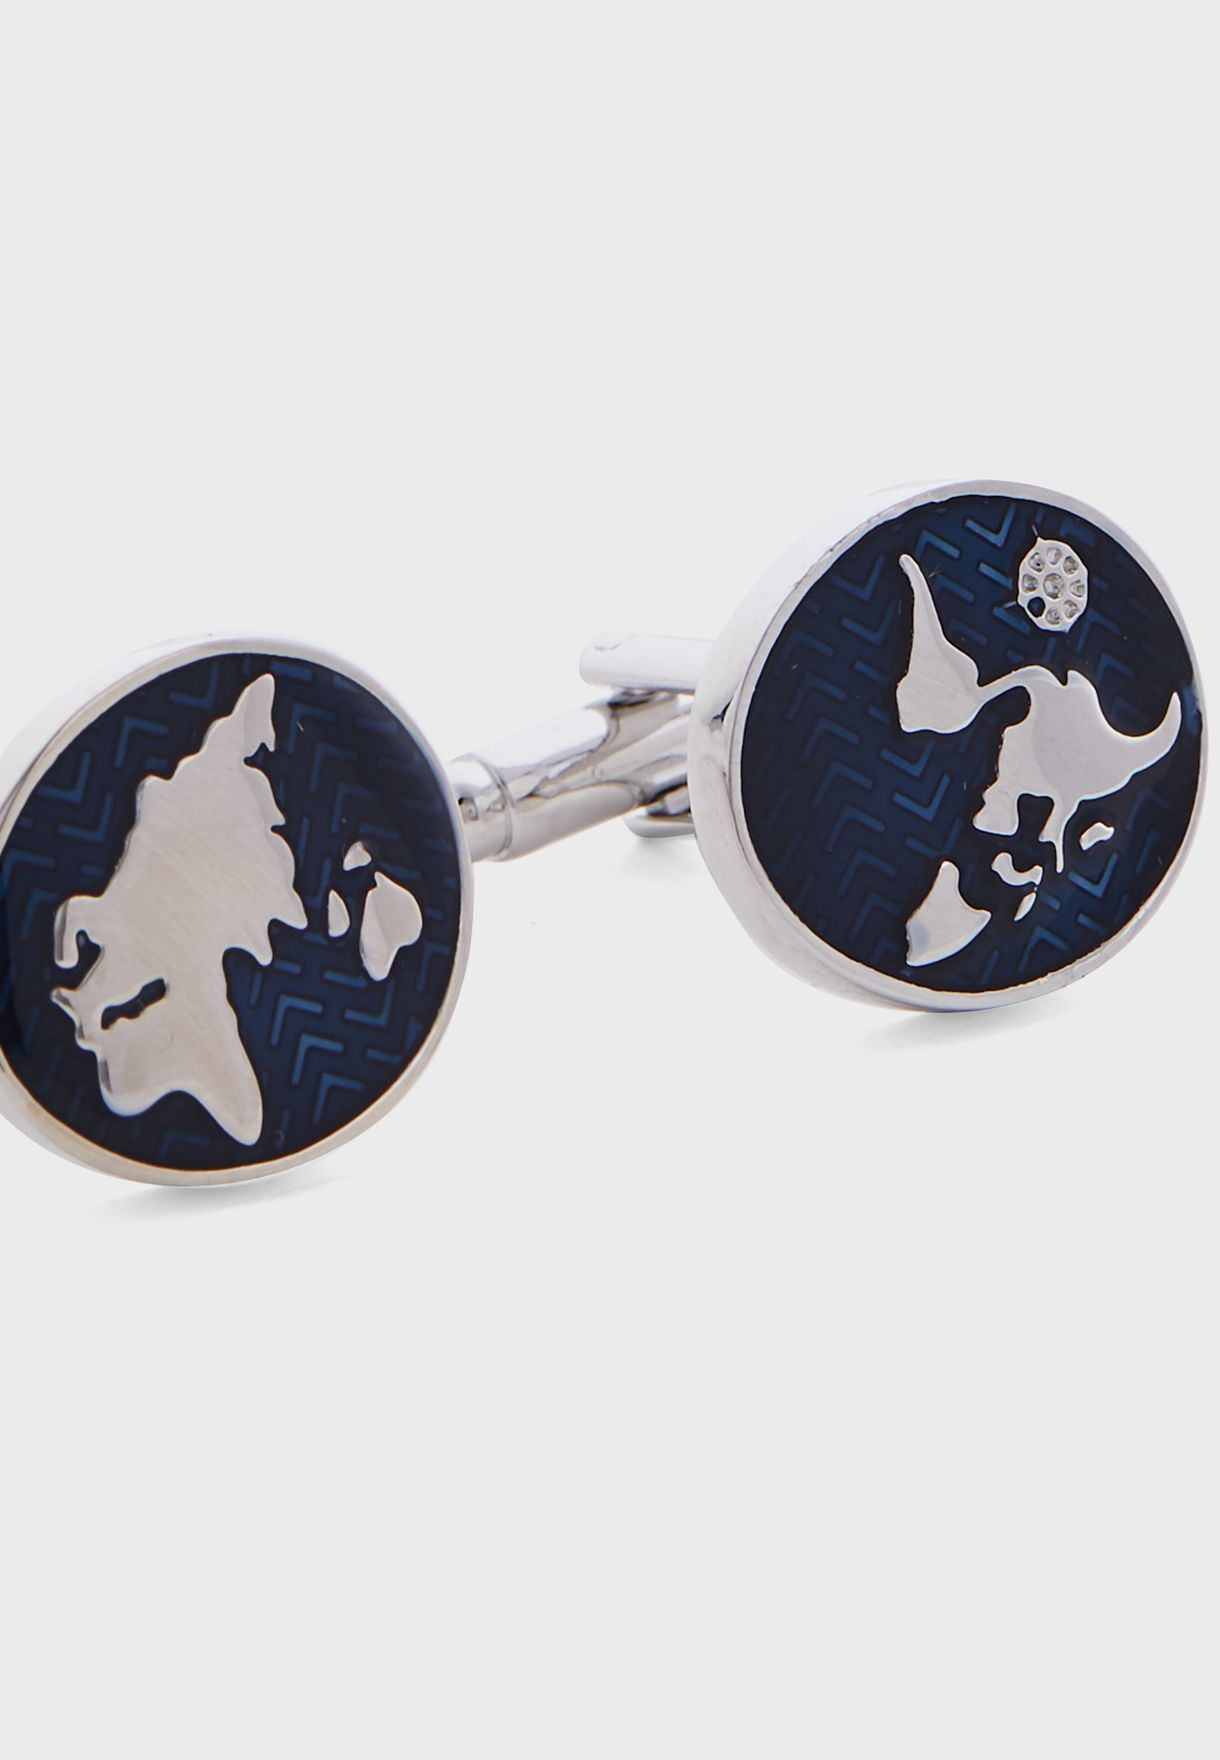 World Map Cuff Links